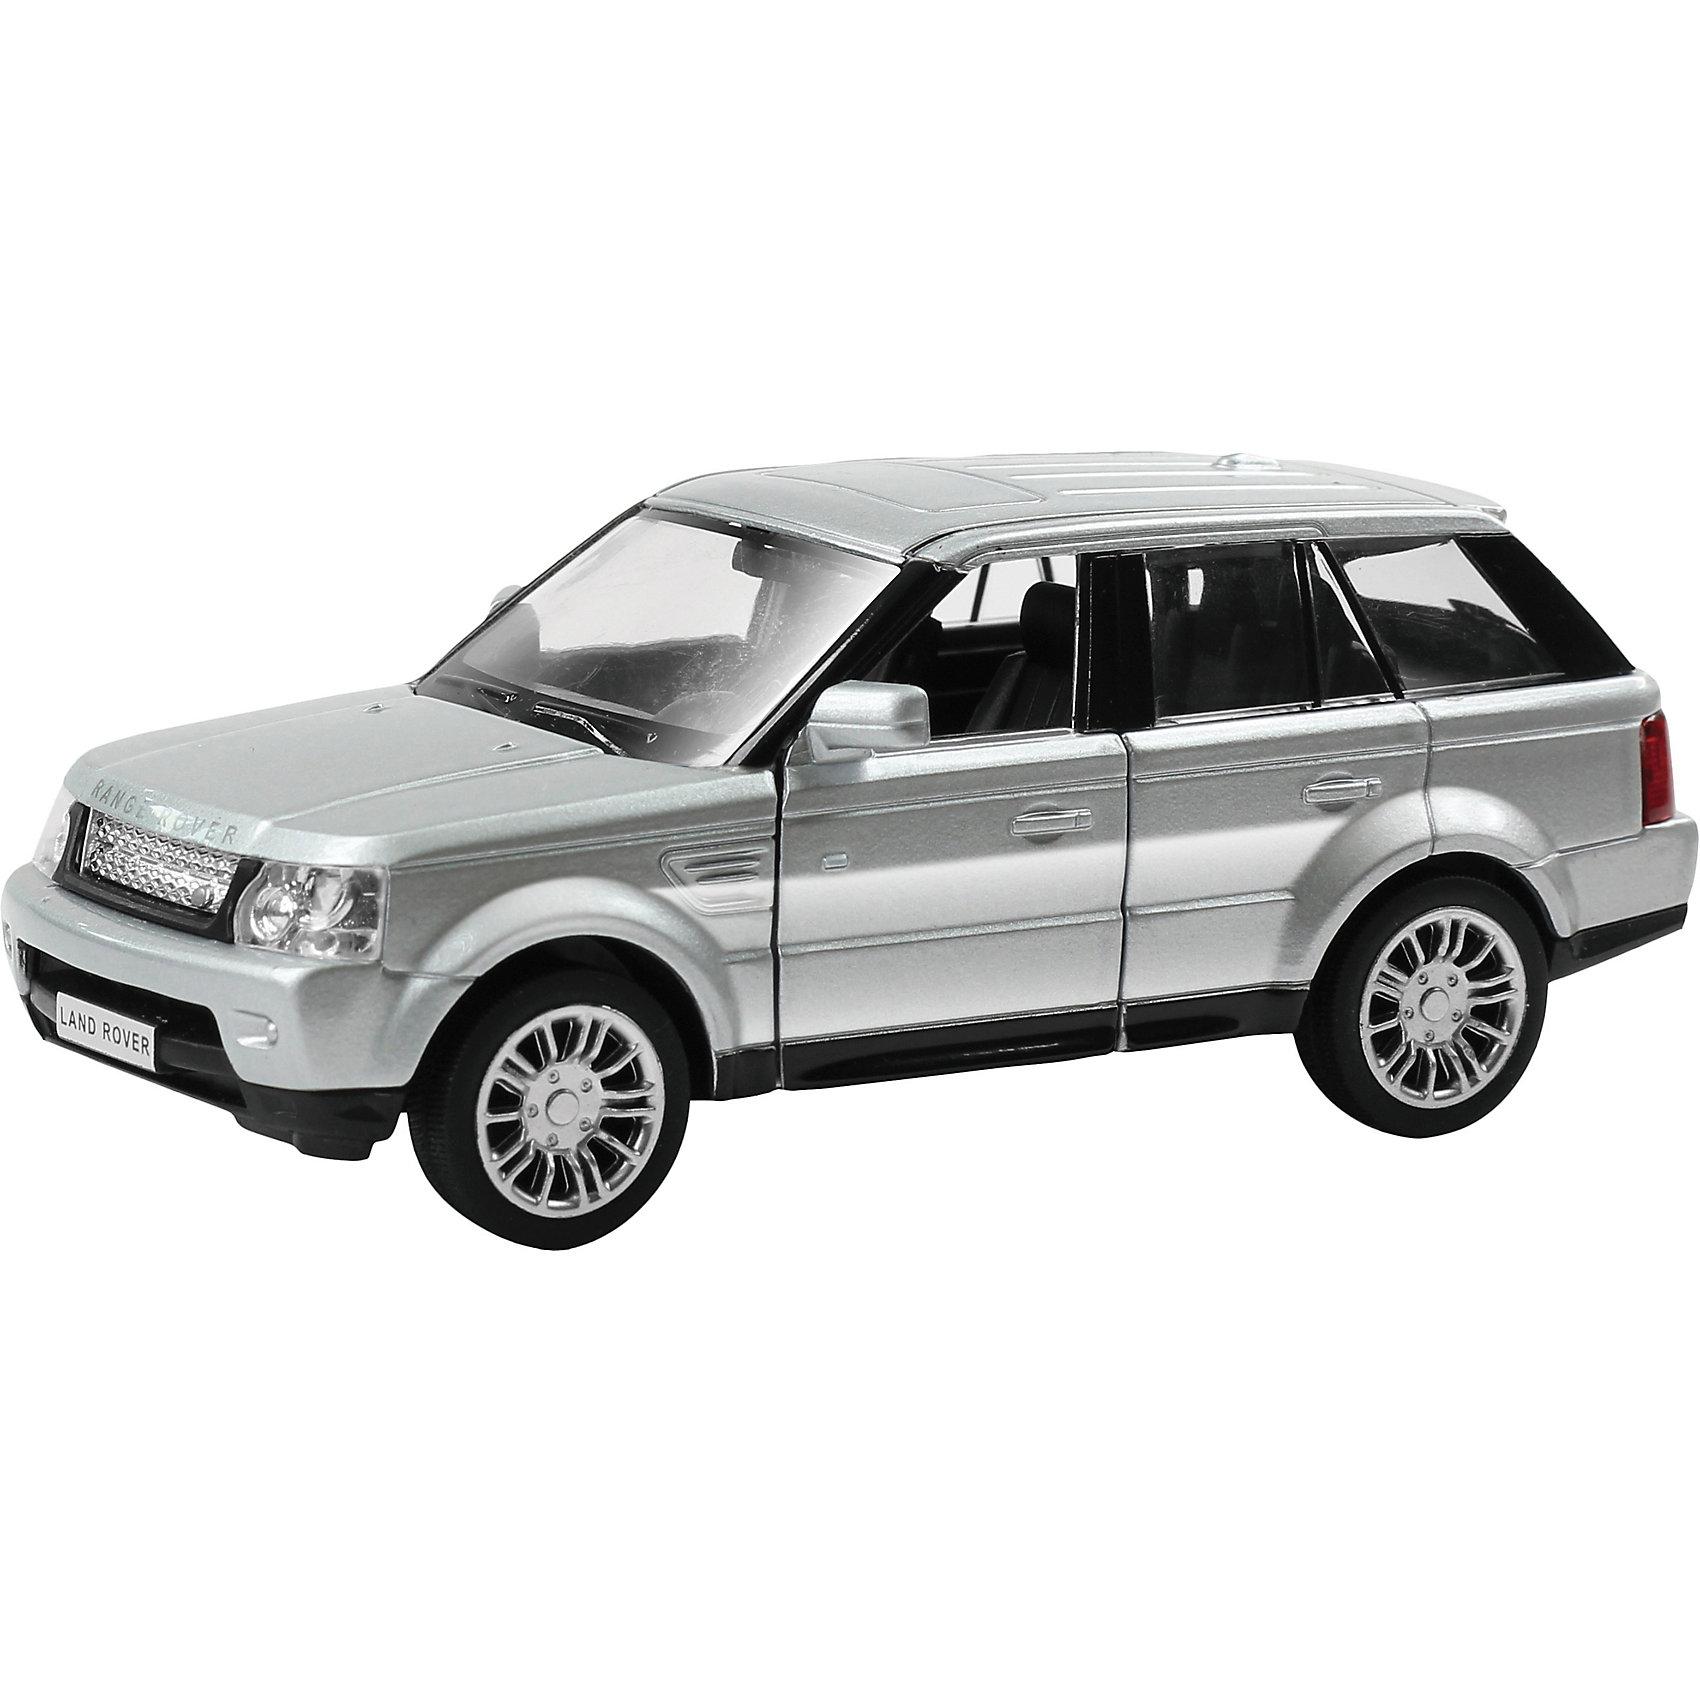 Машинка Land Rover Range Rover Sport 5, AutotimeМашинки<br><br><br>Ширина мм: 165<br>Глубина мм: 57<br>Высота мм: 75<br>Вес г: 13<br>Возраст от месяцев: 36<br>Возраст до месяцев: 2147483647<br>Пол: Мужской<br>Возраст: Детский<br>SKU: 5584107